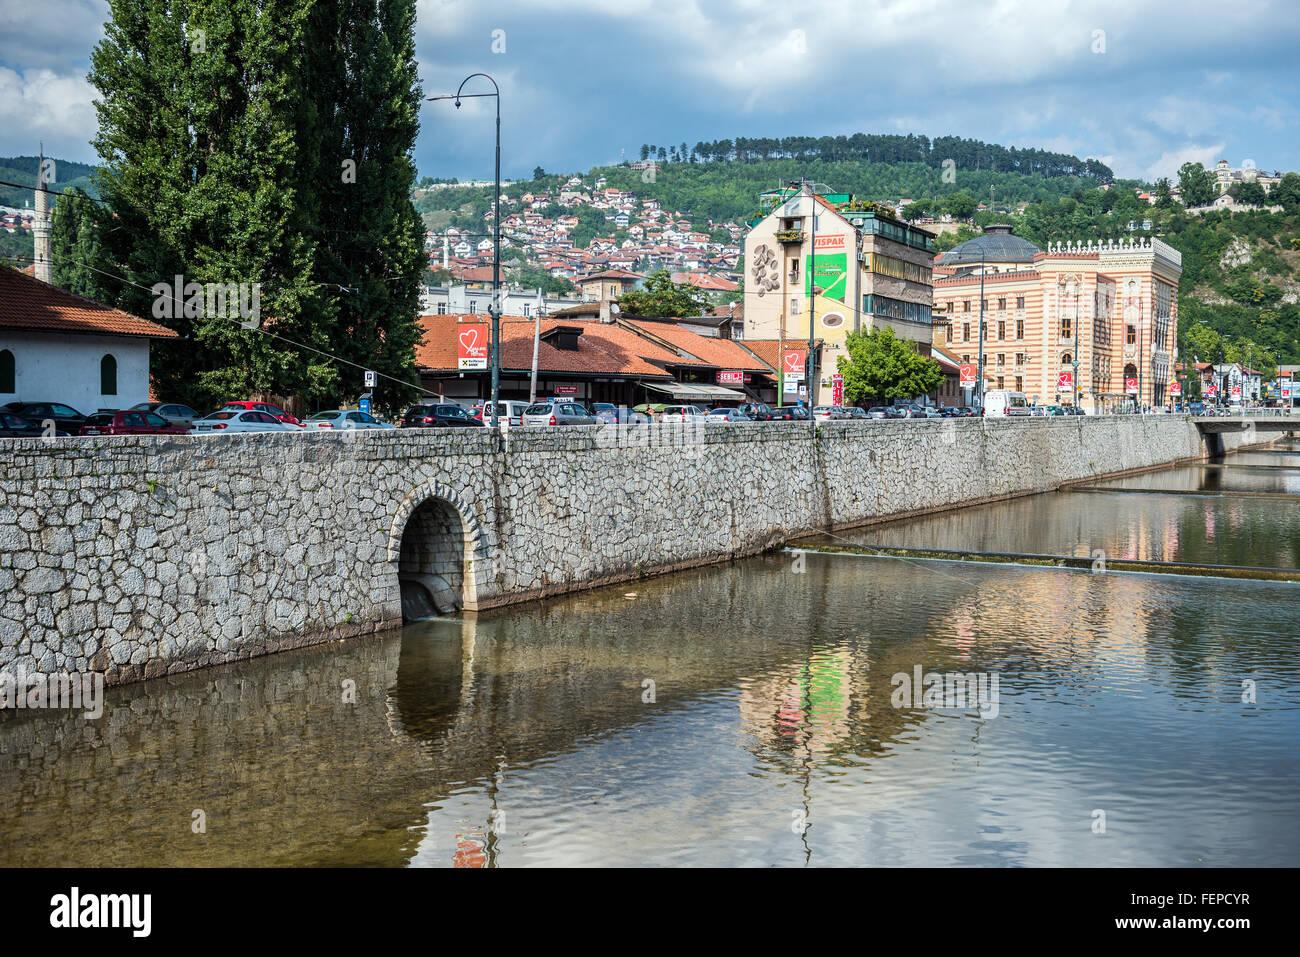 city hall sarajevo bosnia stockfotos city hall sarajevo bosnia bilder alamy. Black Bedroom Furniture Sets. Home Design Ideas